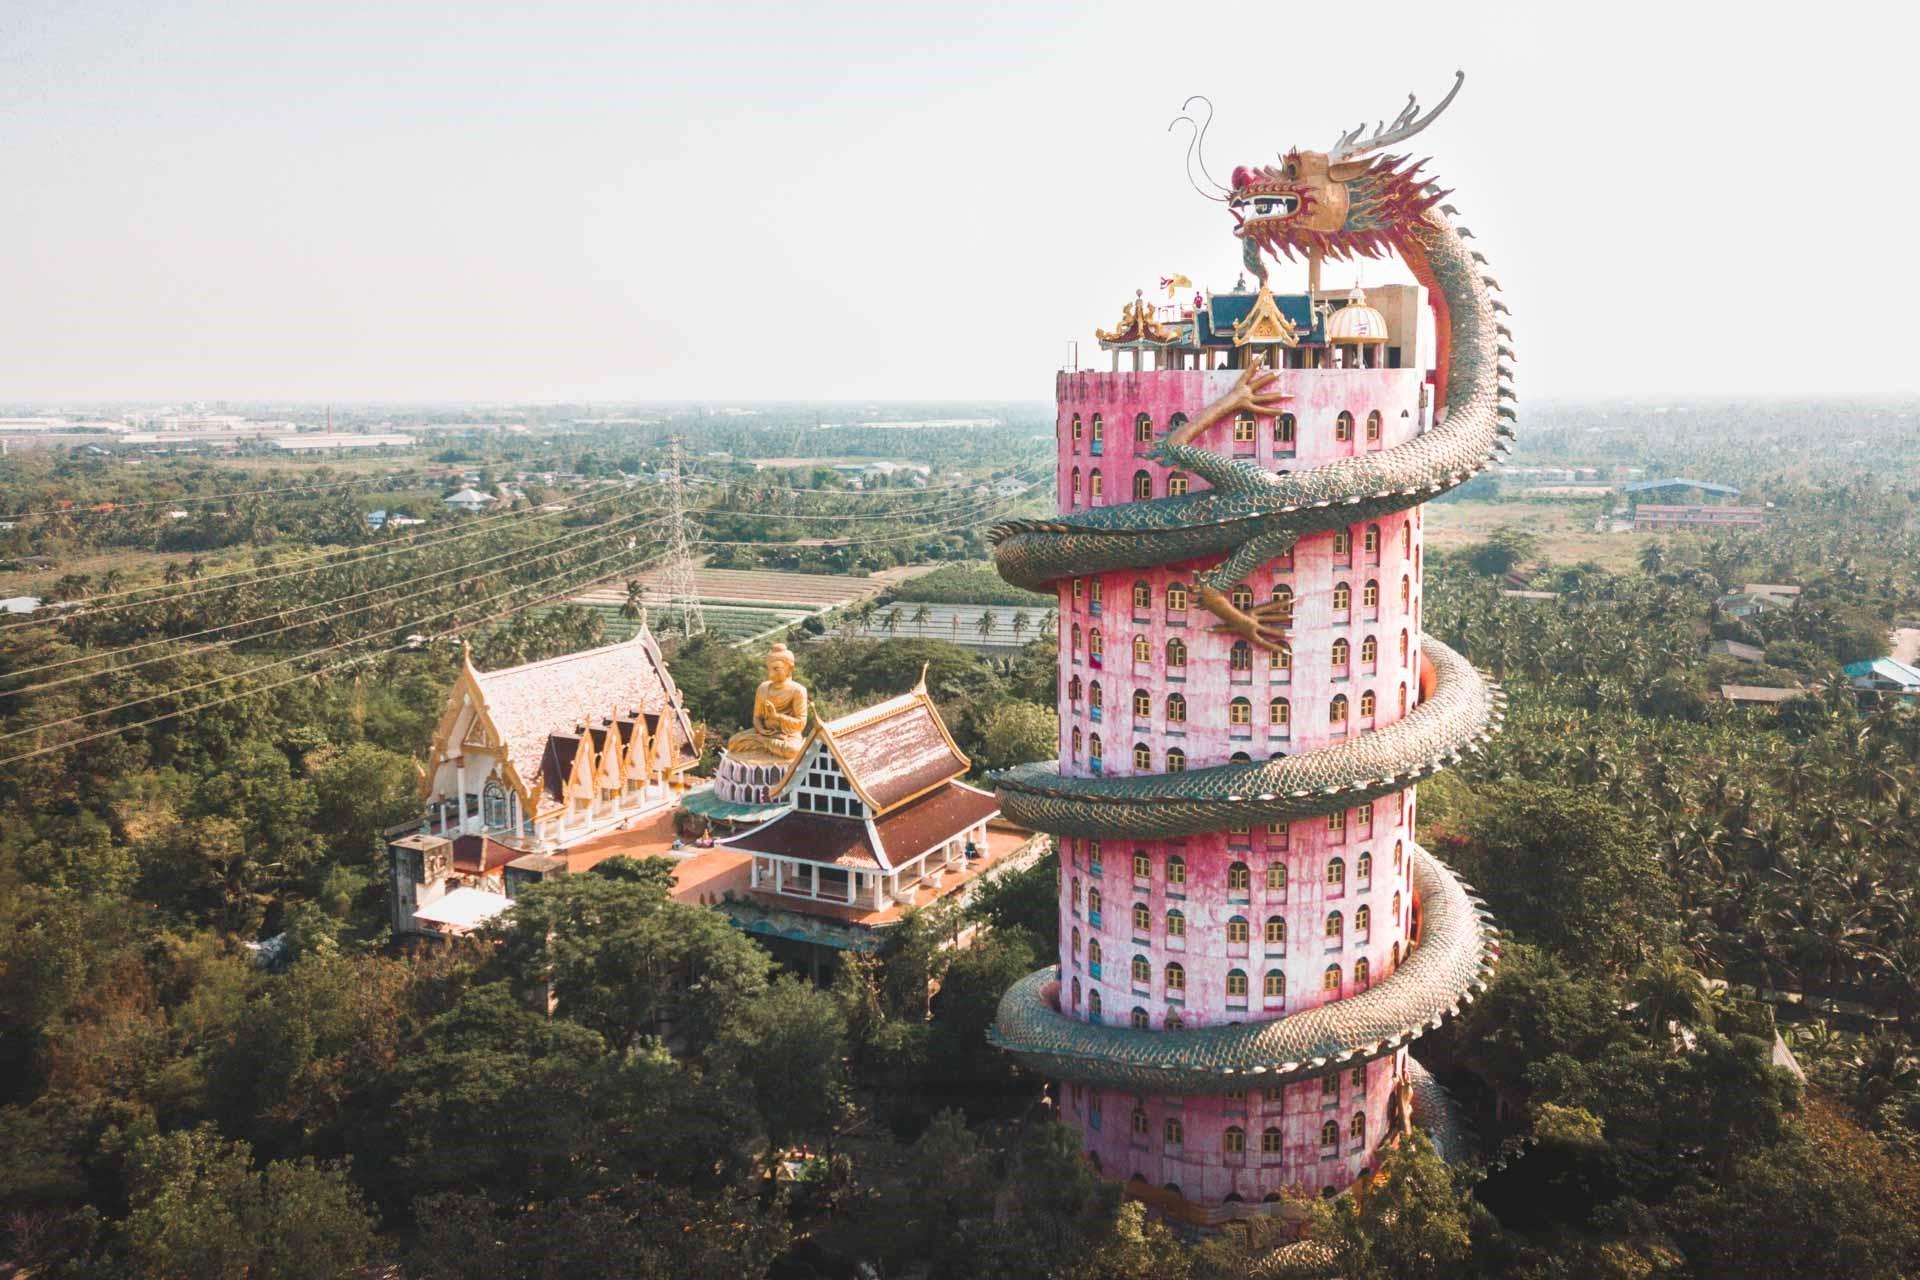 The Dragon Building in Wat Samphran | 7 Thailand's Most Exquisite Architectural Wonders | Brain Berries